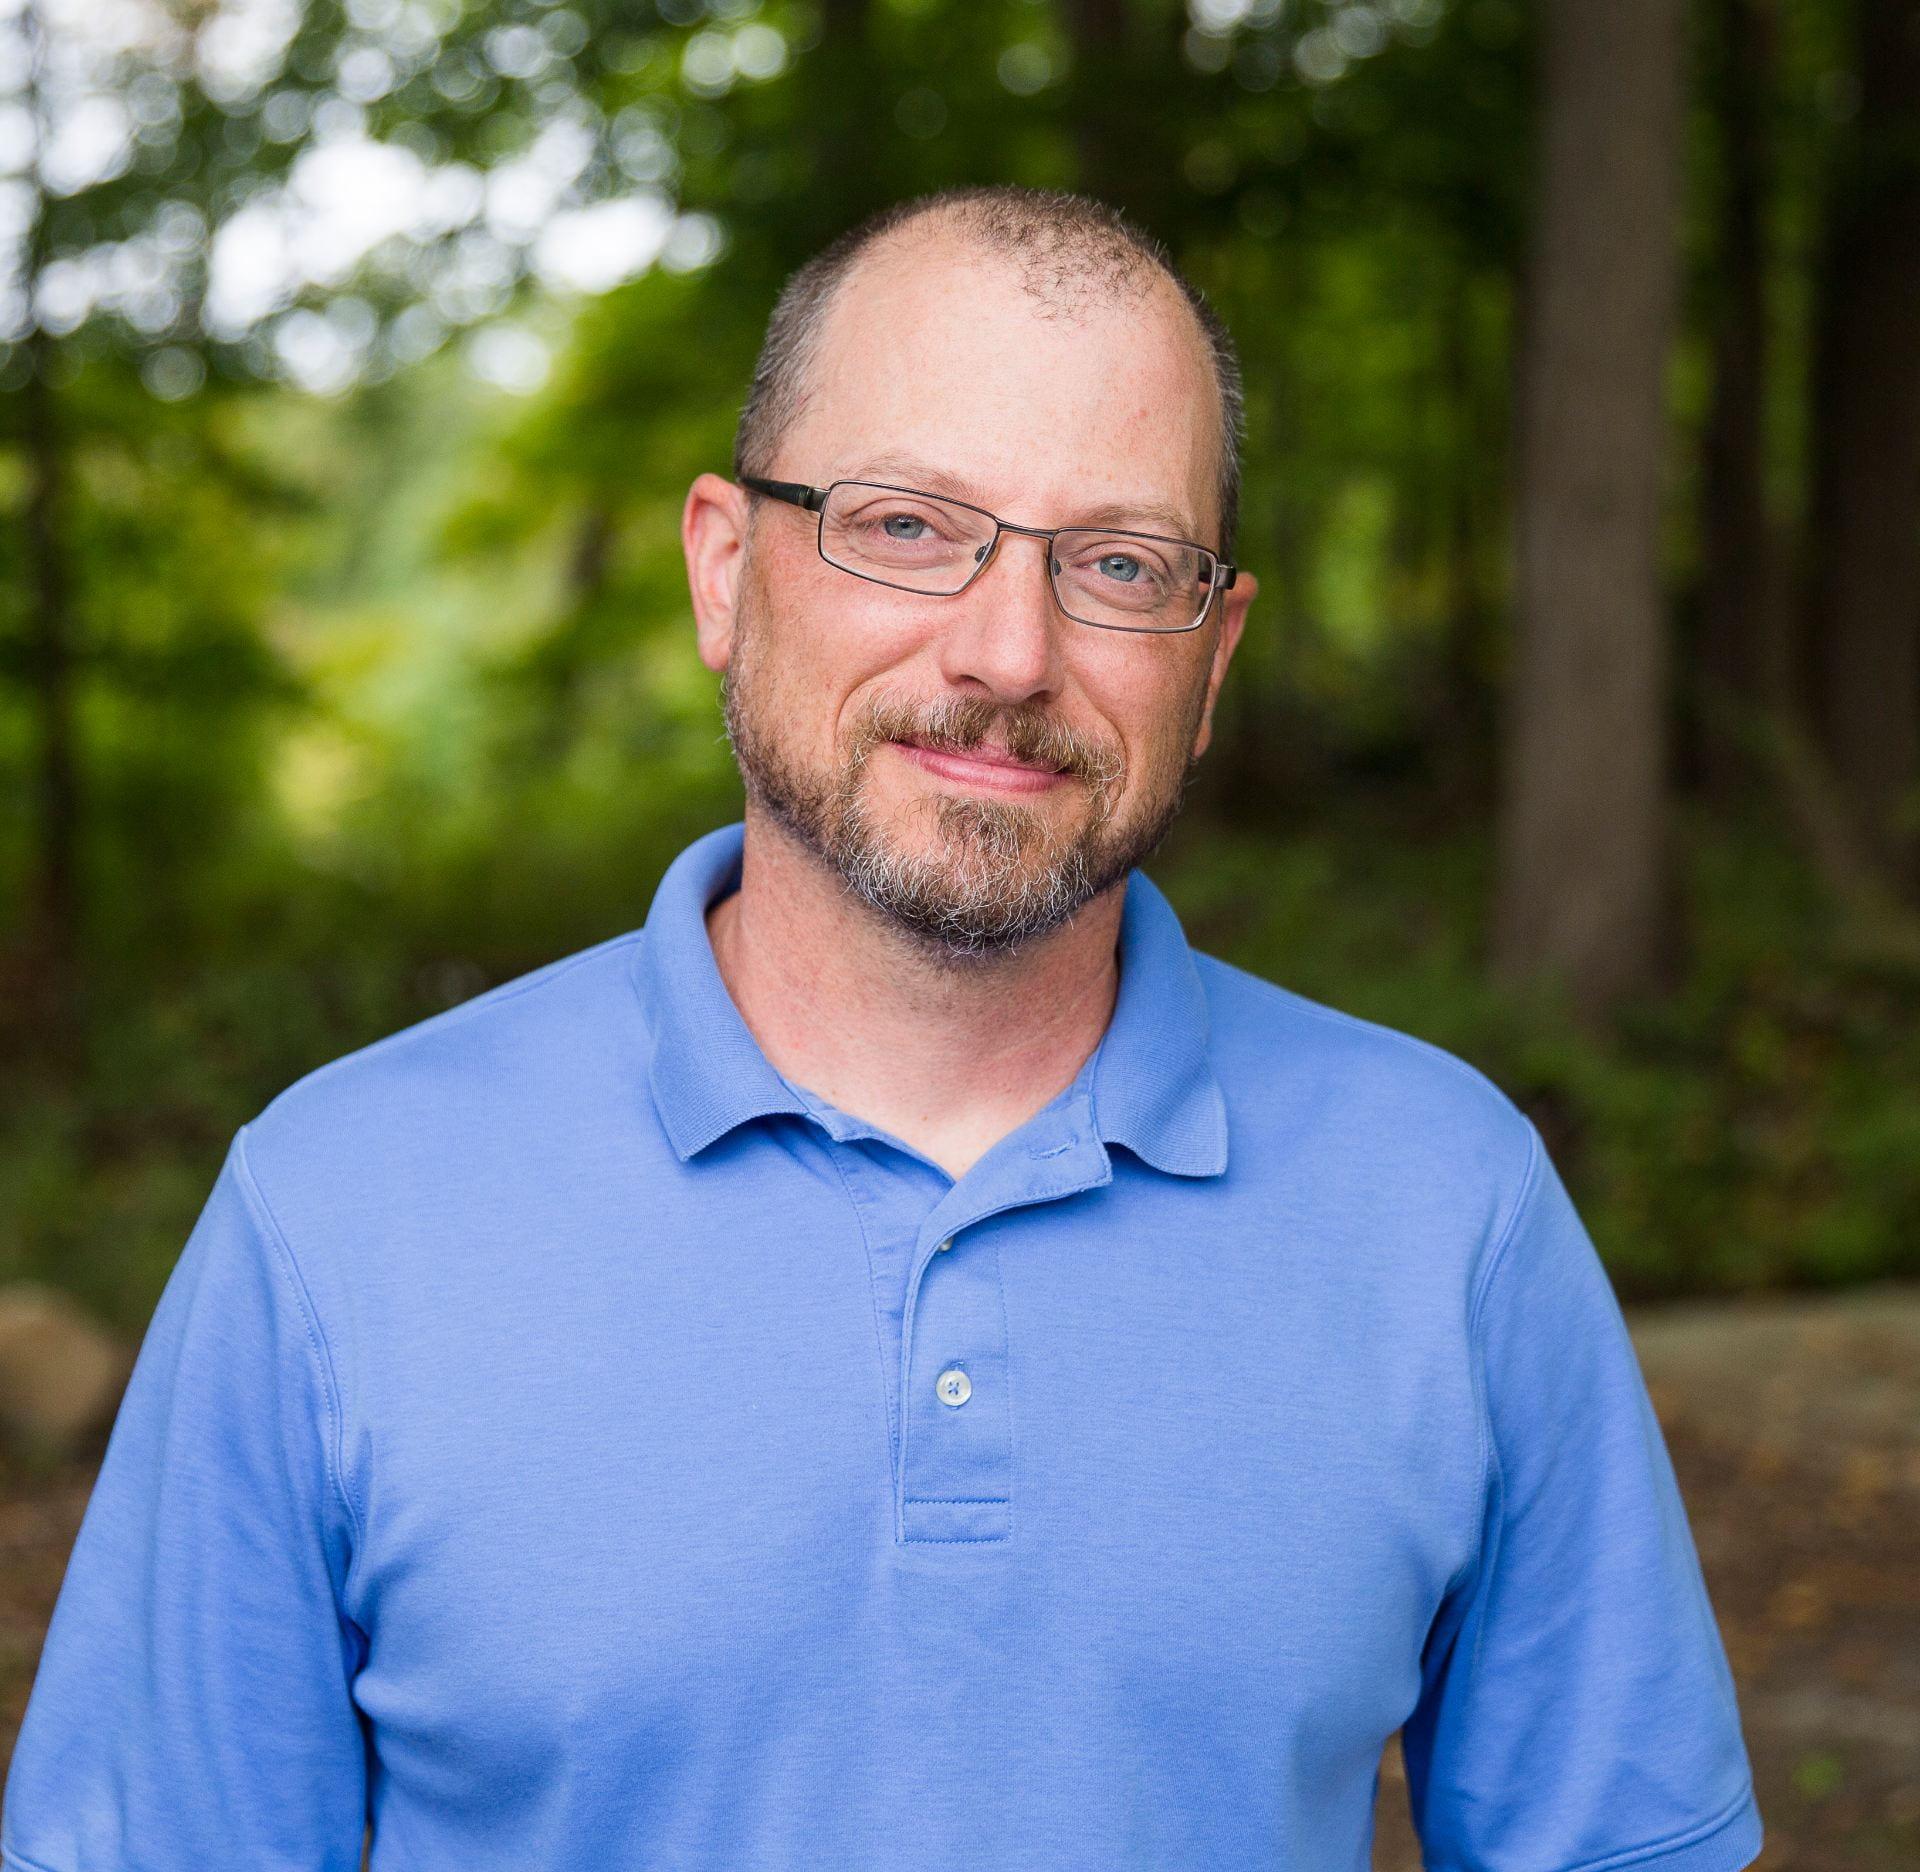 Michael Rubbo, PhD